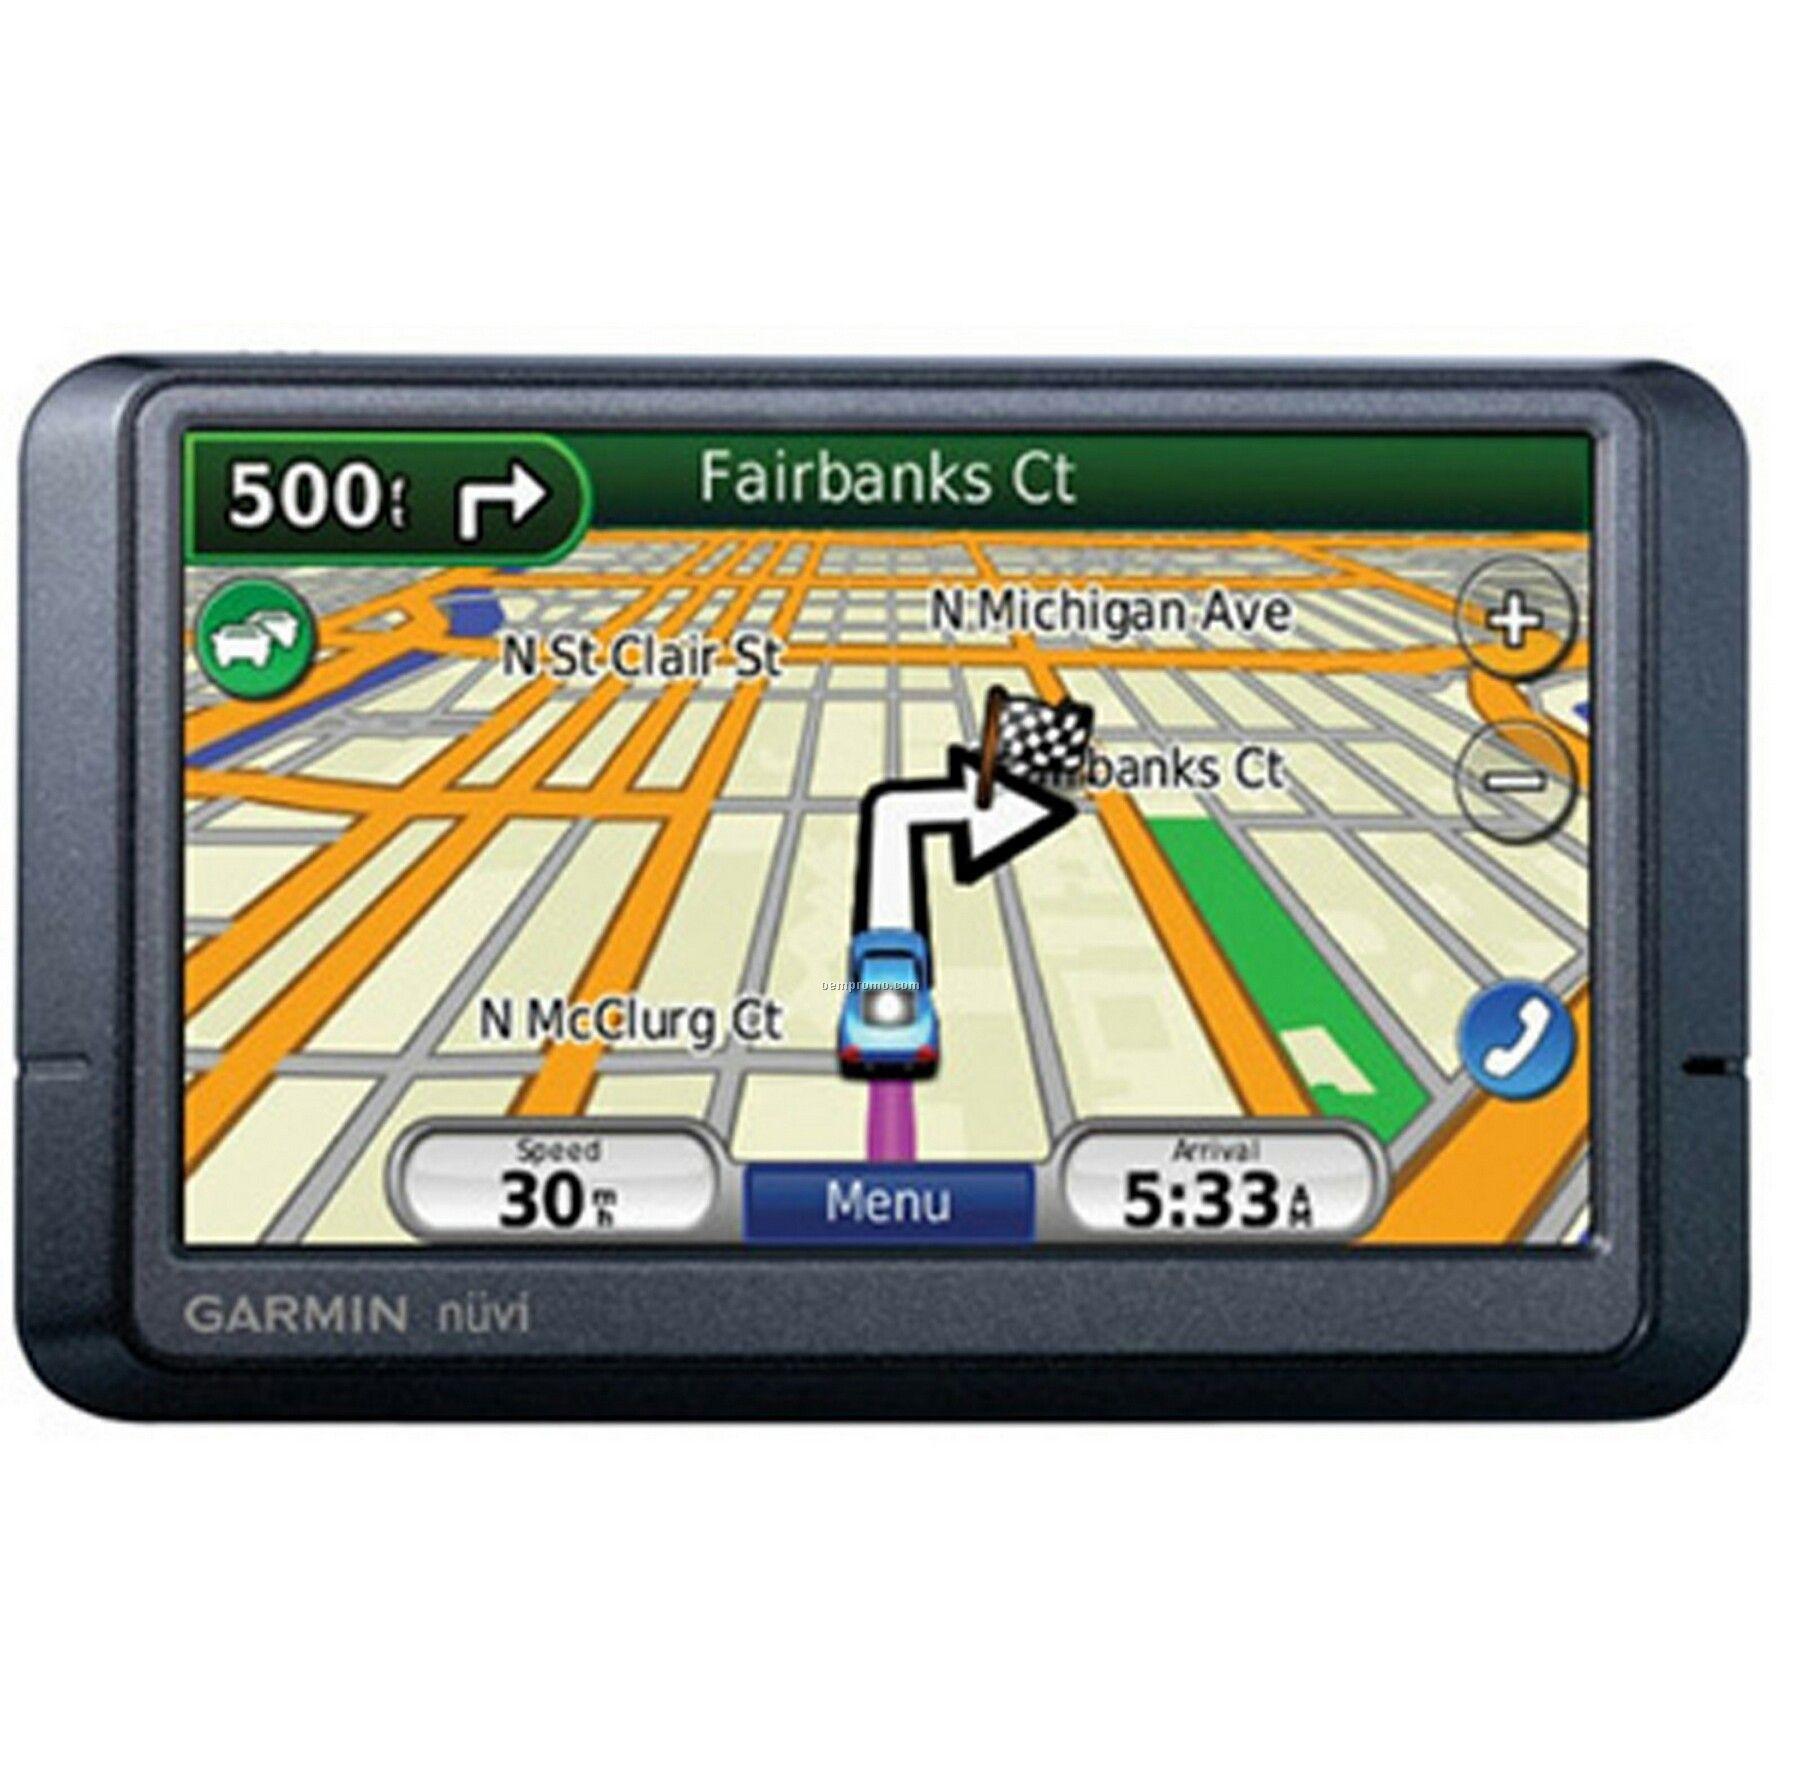 Car Gps System Product : Garmin nuvi w gps vehicle navigation system china